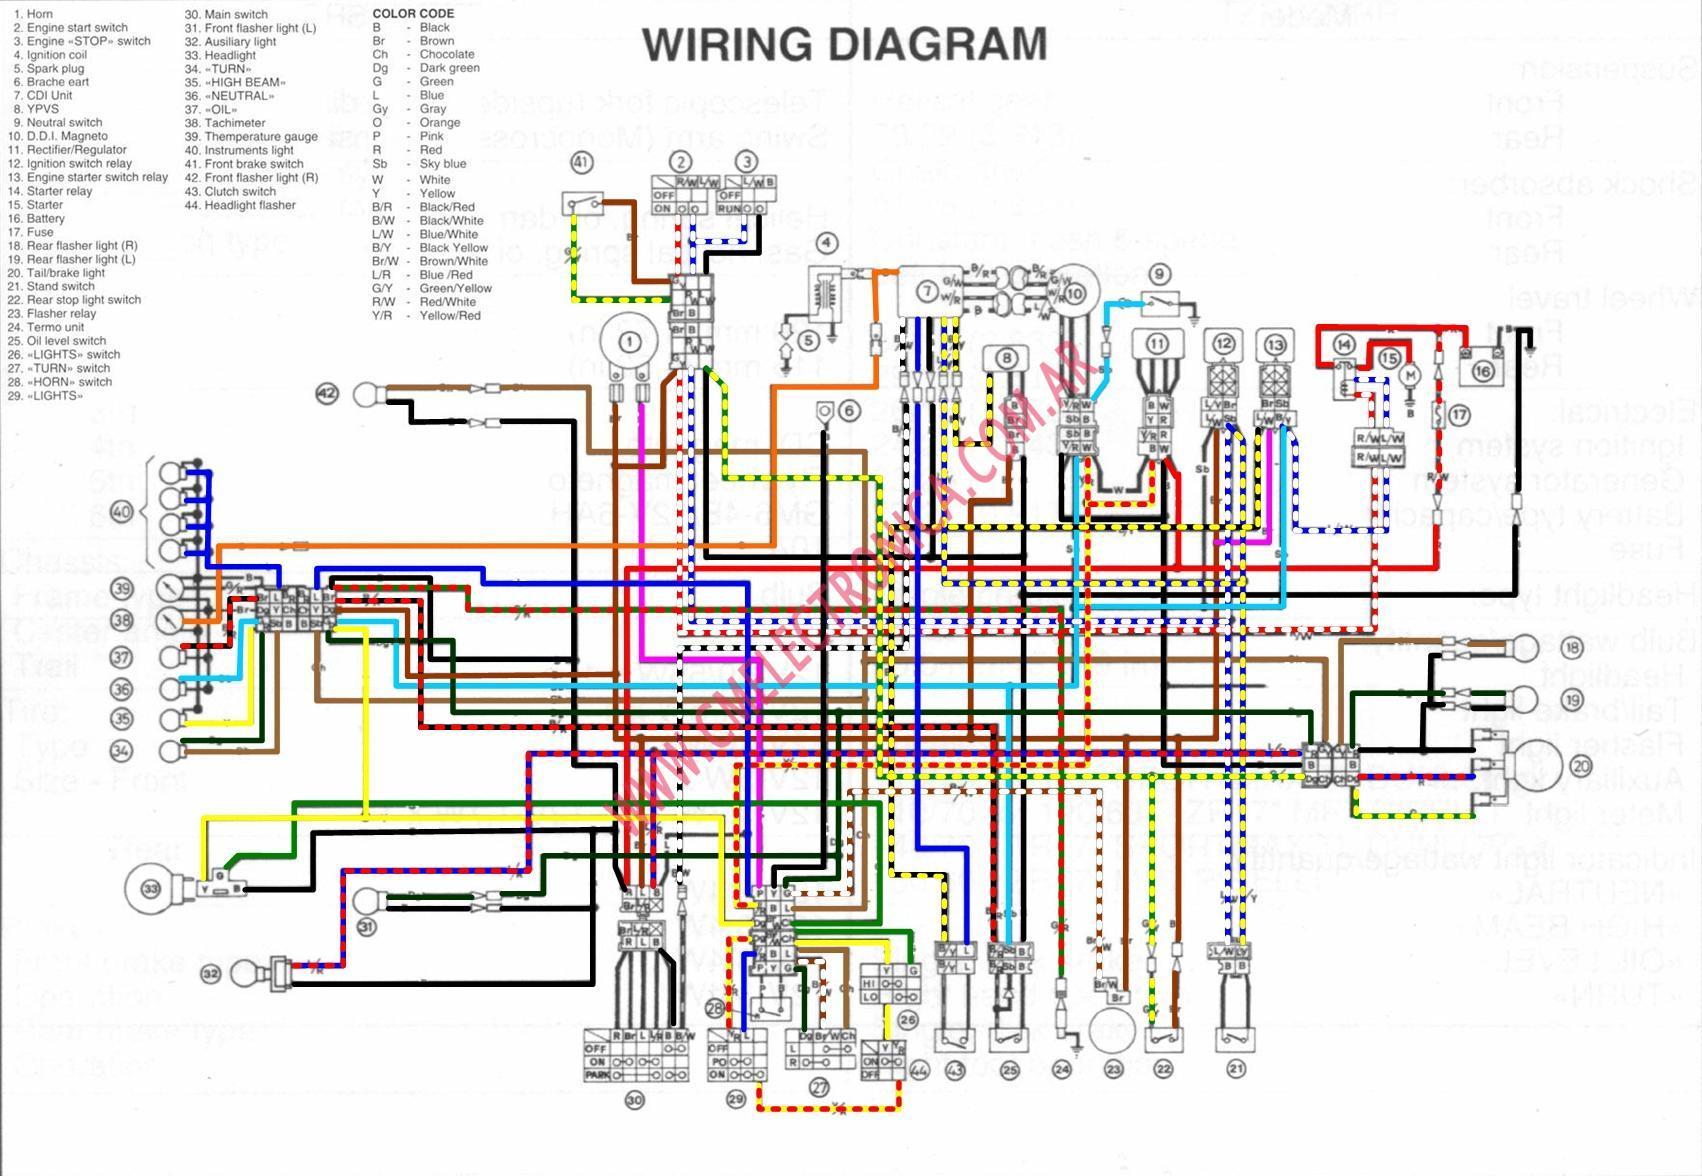 Yamaha Dt 125 X Wiring Diagram